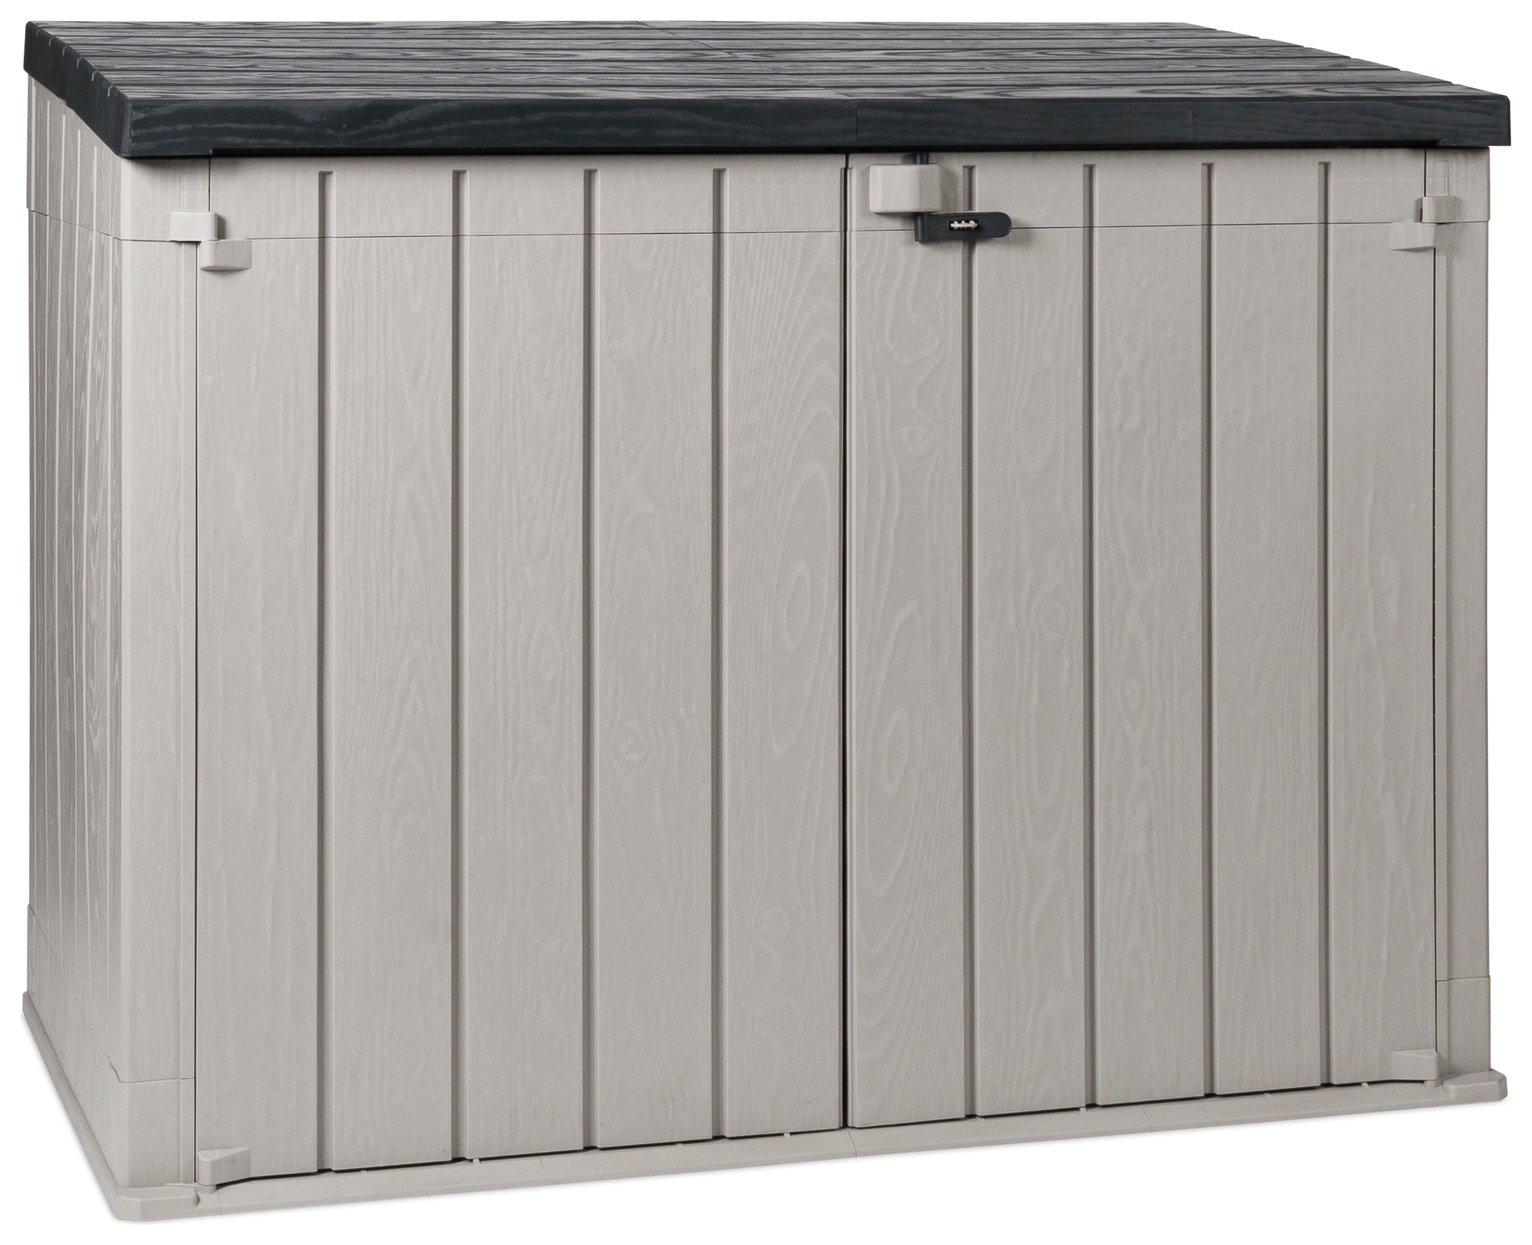 Toomax Storaway 1270L Wood Effect Garden Storage Box - Grey